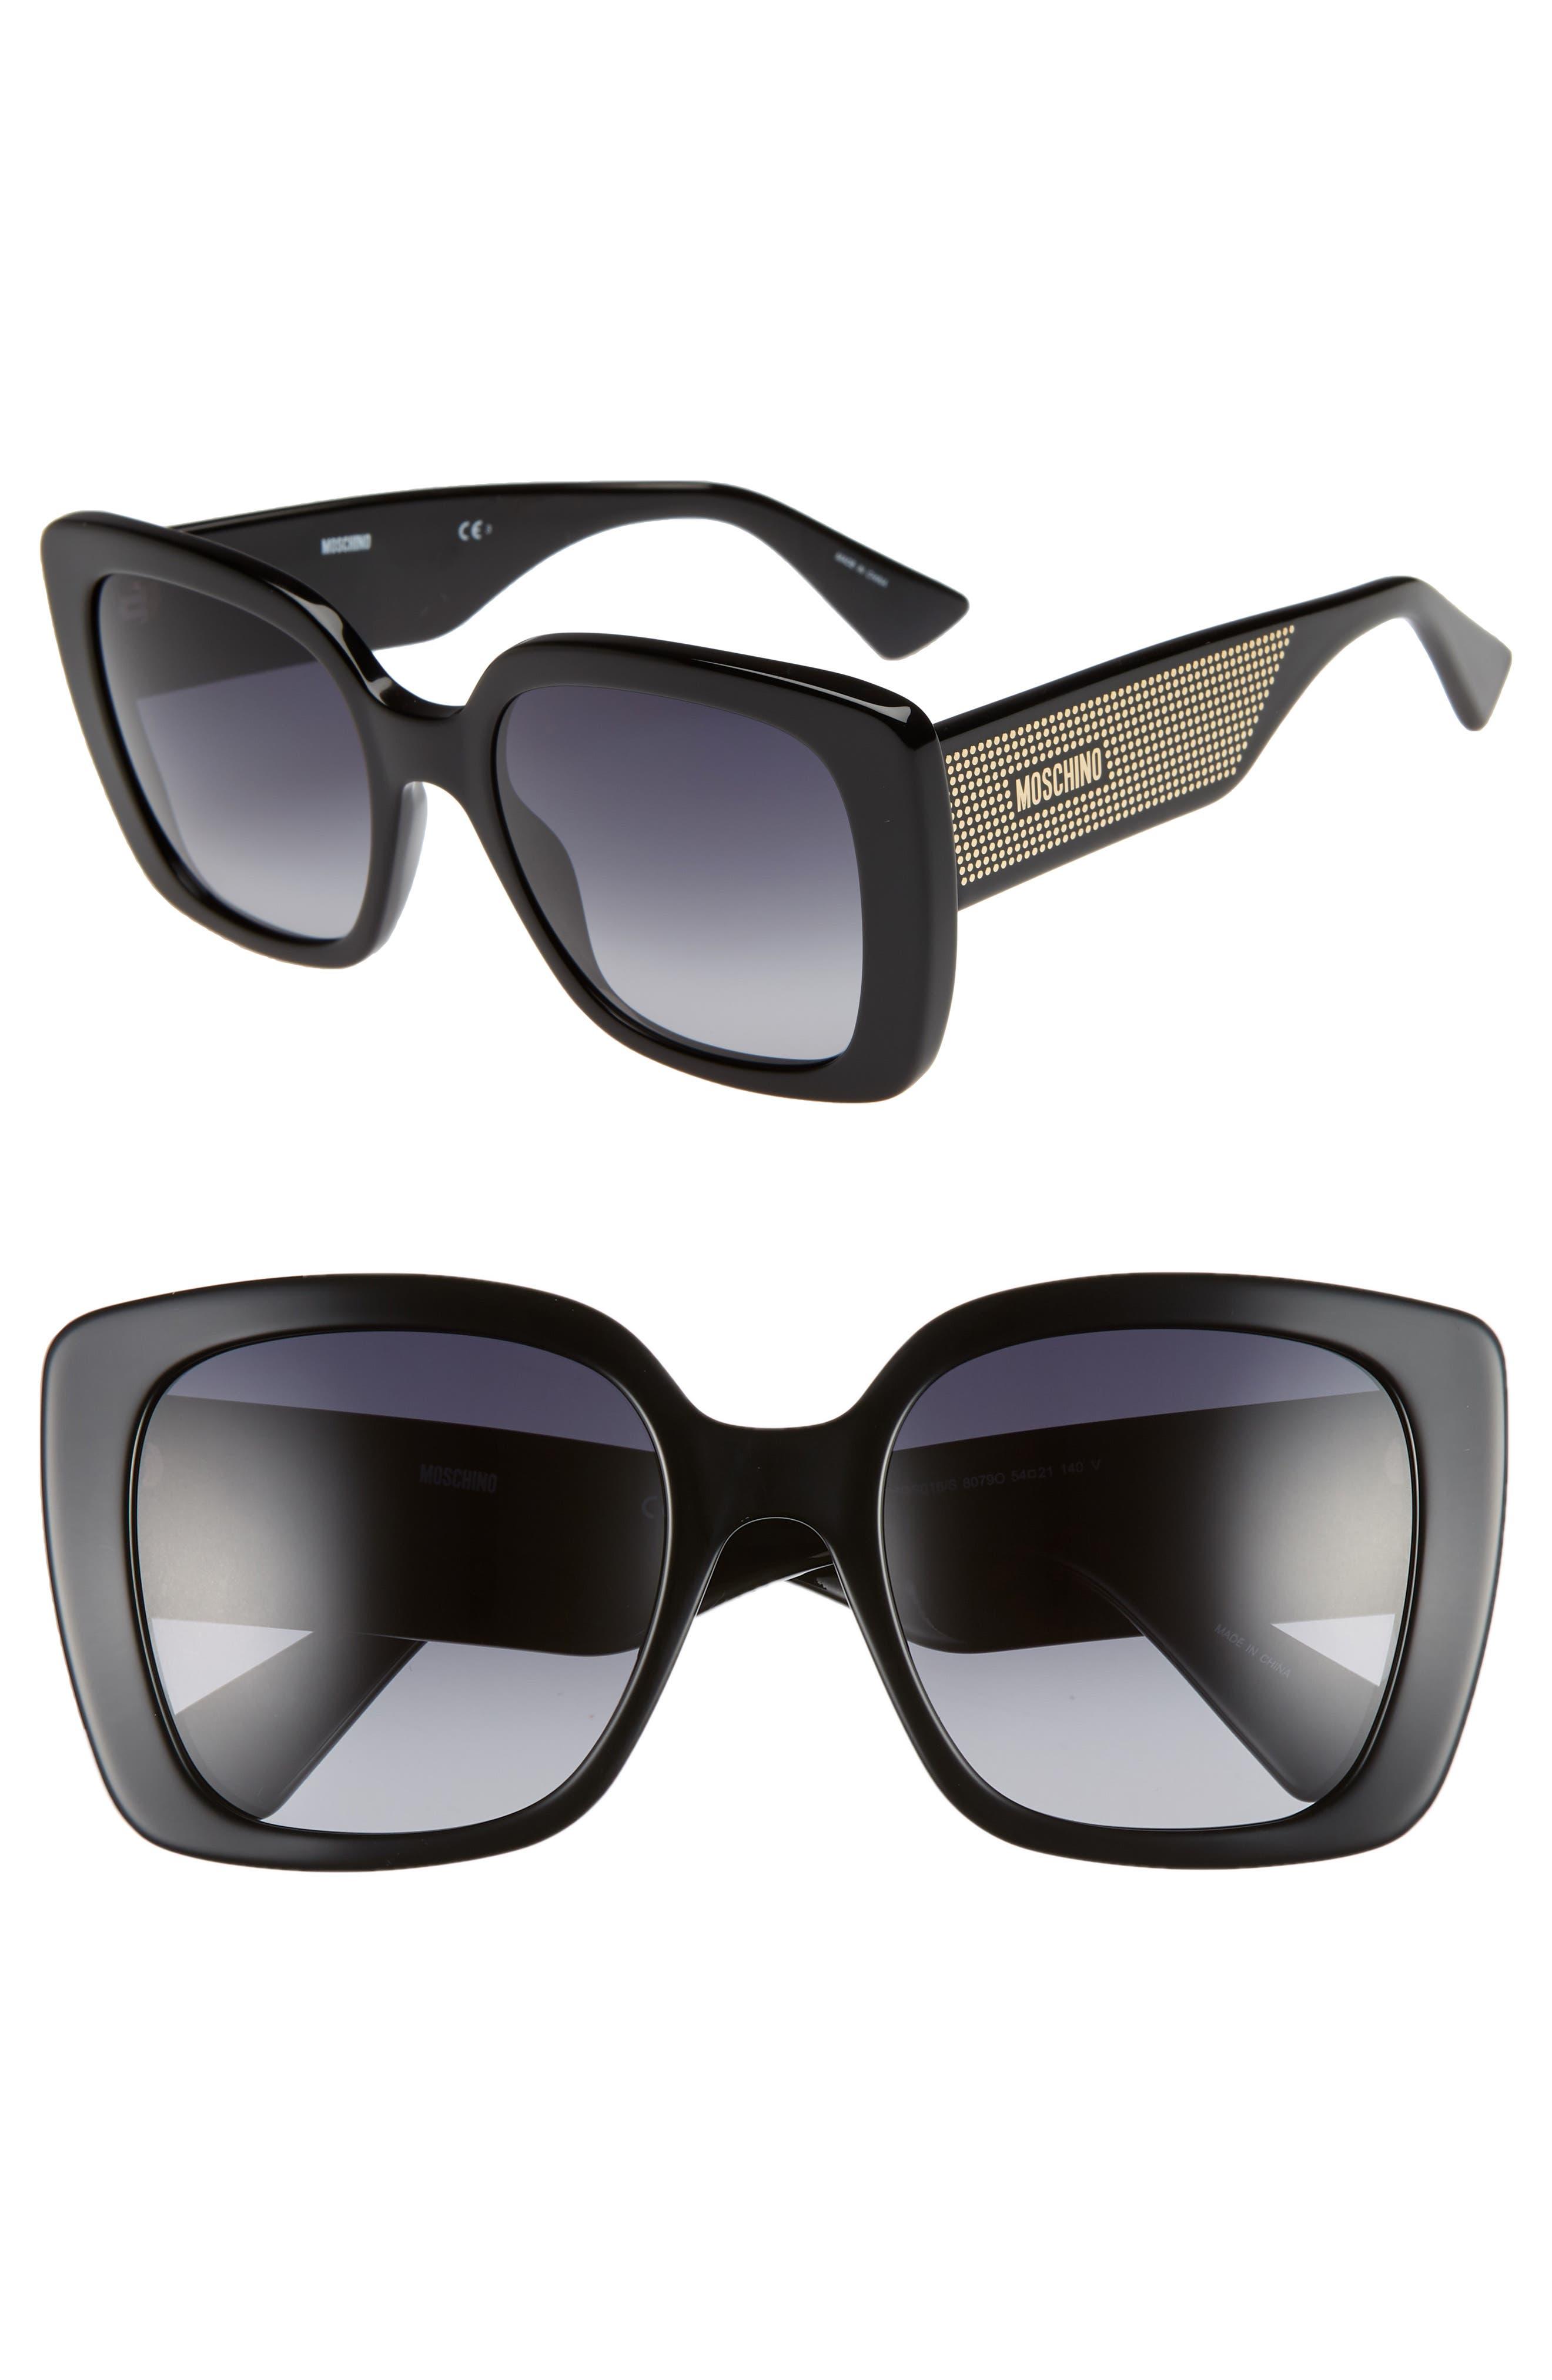 MOSCHINO, 54mm Square Sunglasses, Main thumbnail 1, color, BLACK